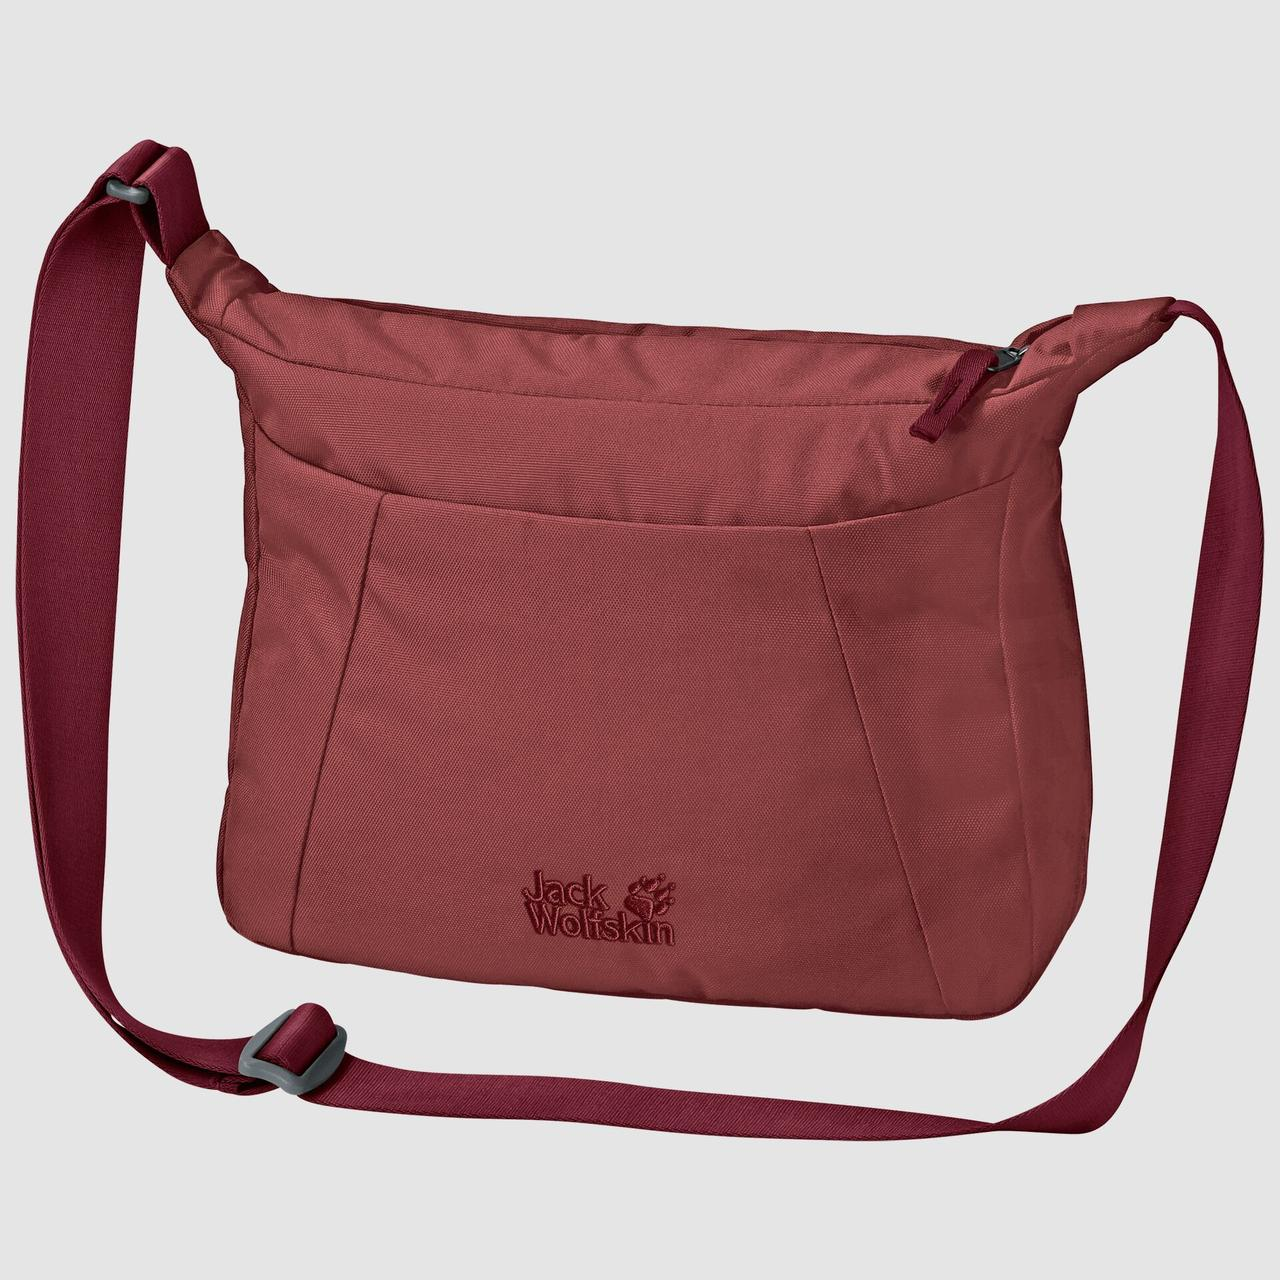 Женская сумка Jack Wolfskin Valparaiso